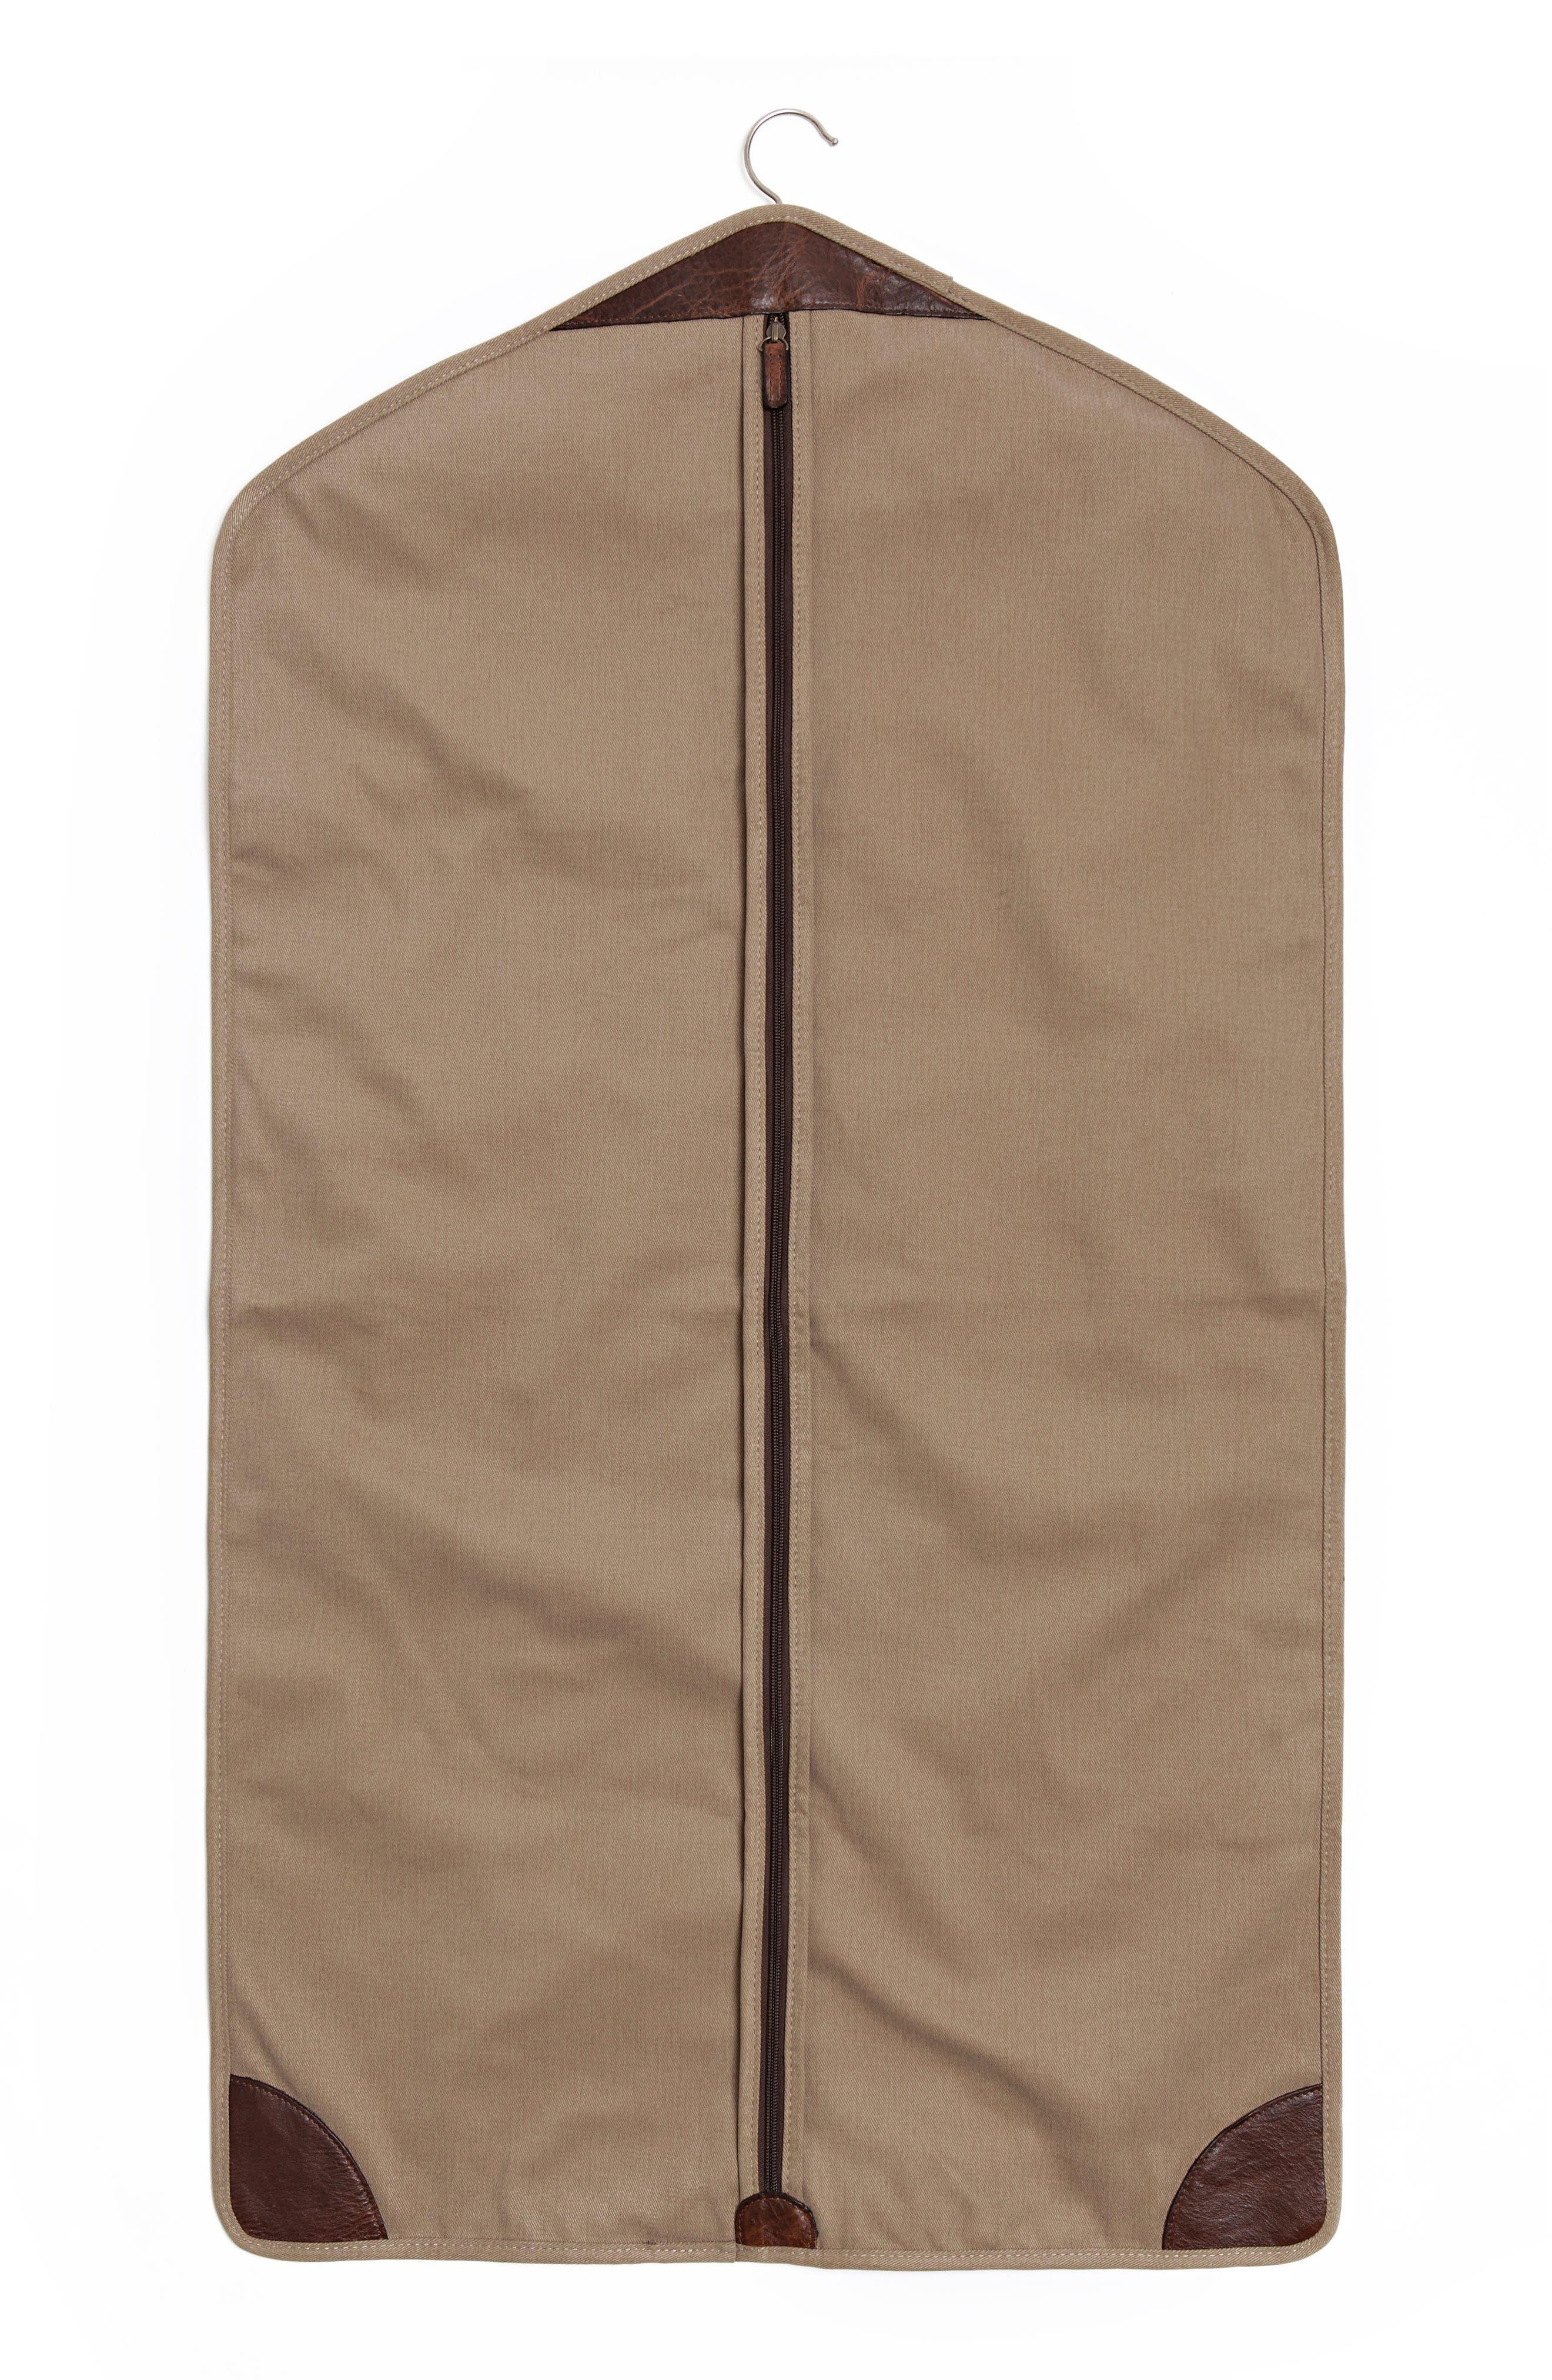 Holton Garment Bag,                         Main,                         color, Brushed Tan Twill